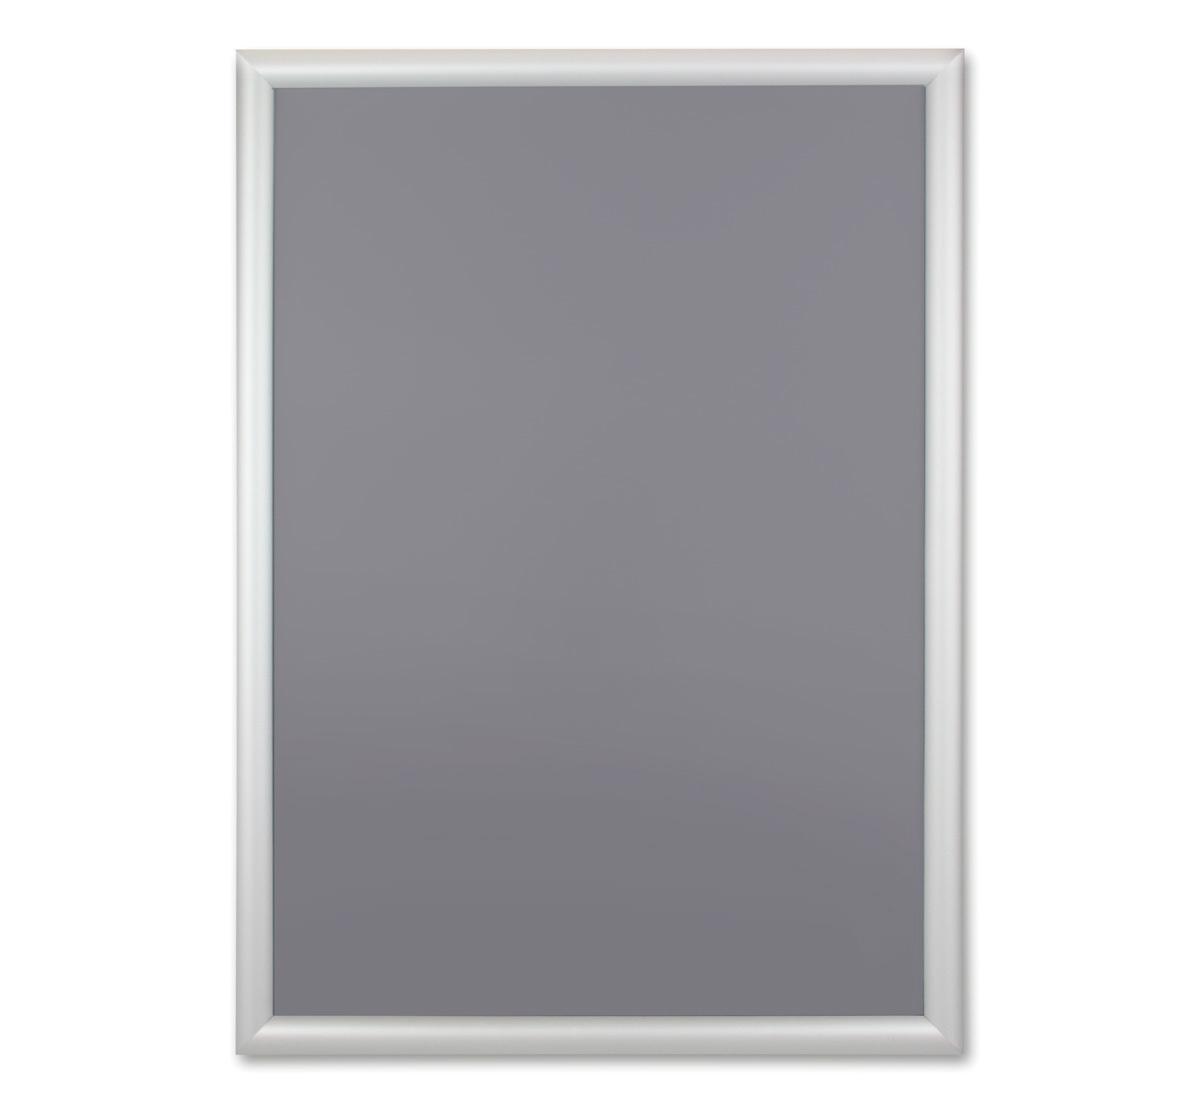 Ramka OWZ A2 plakatowa zatrzaskowa aluminiowa